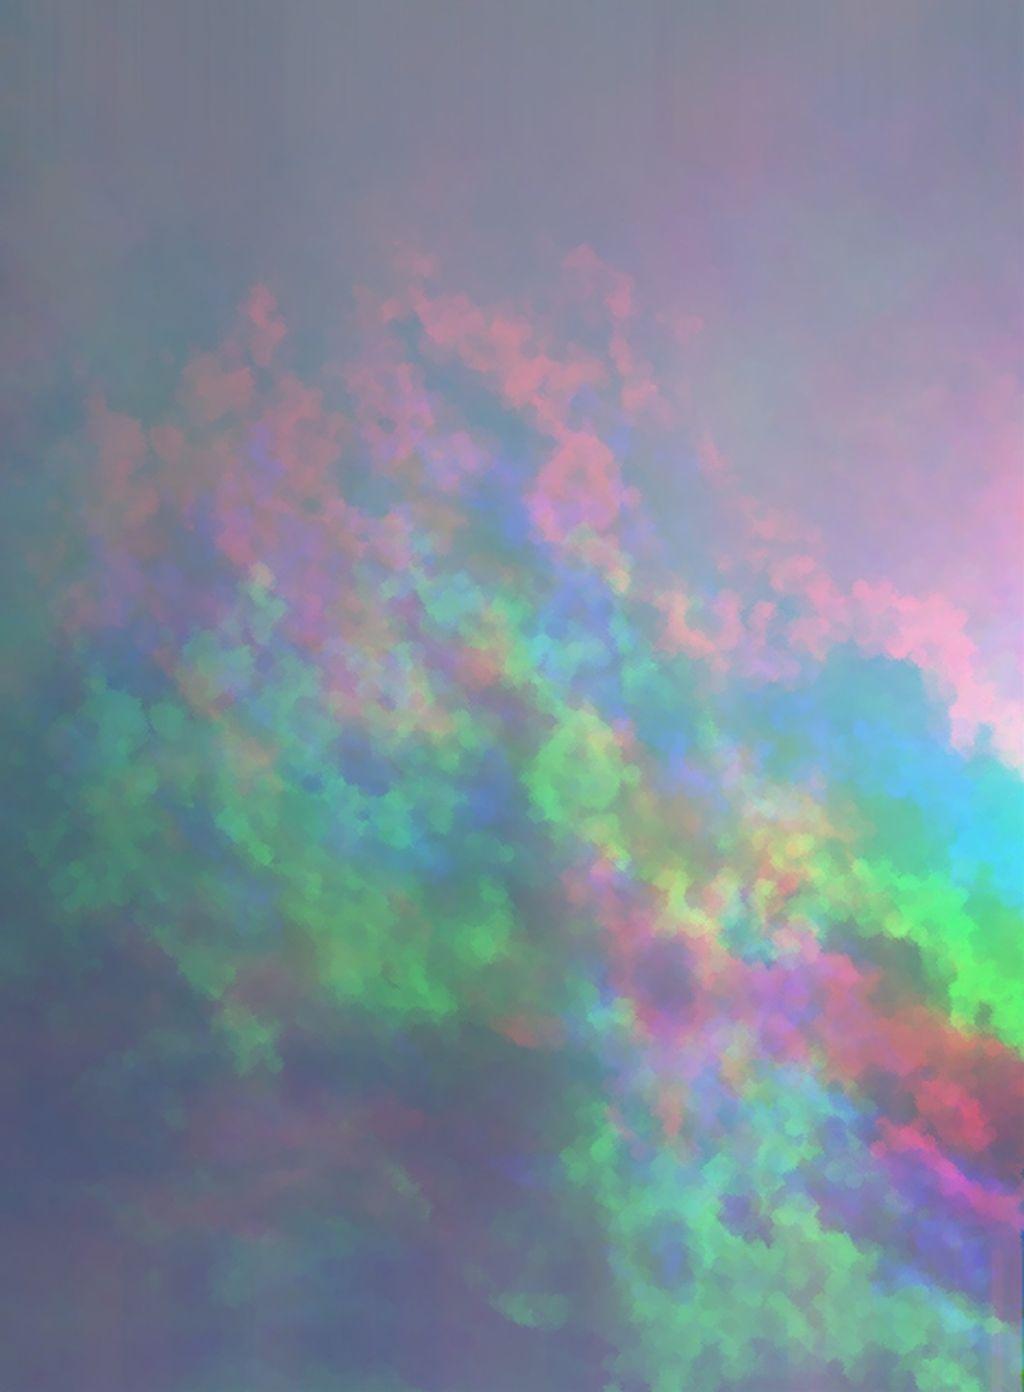 #sheareffect #glitcheffect #glitchfilter #background #holographicbackground  #freetoedit